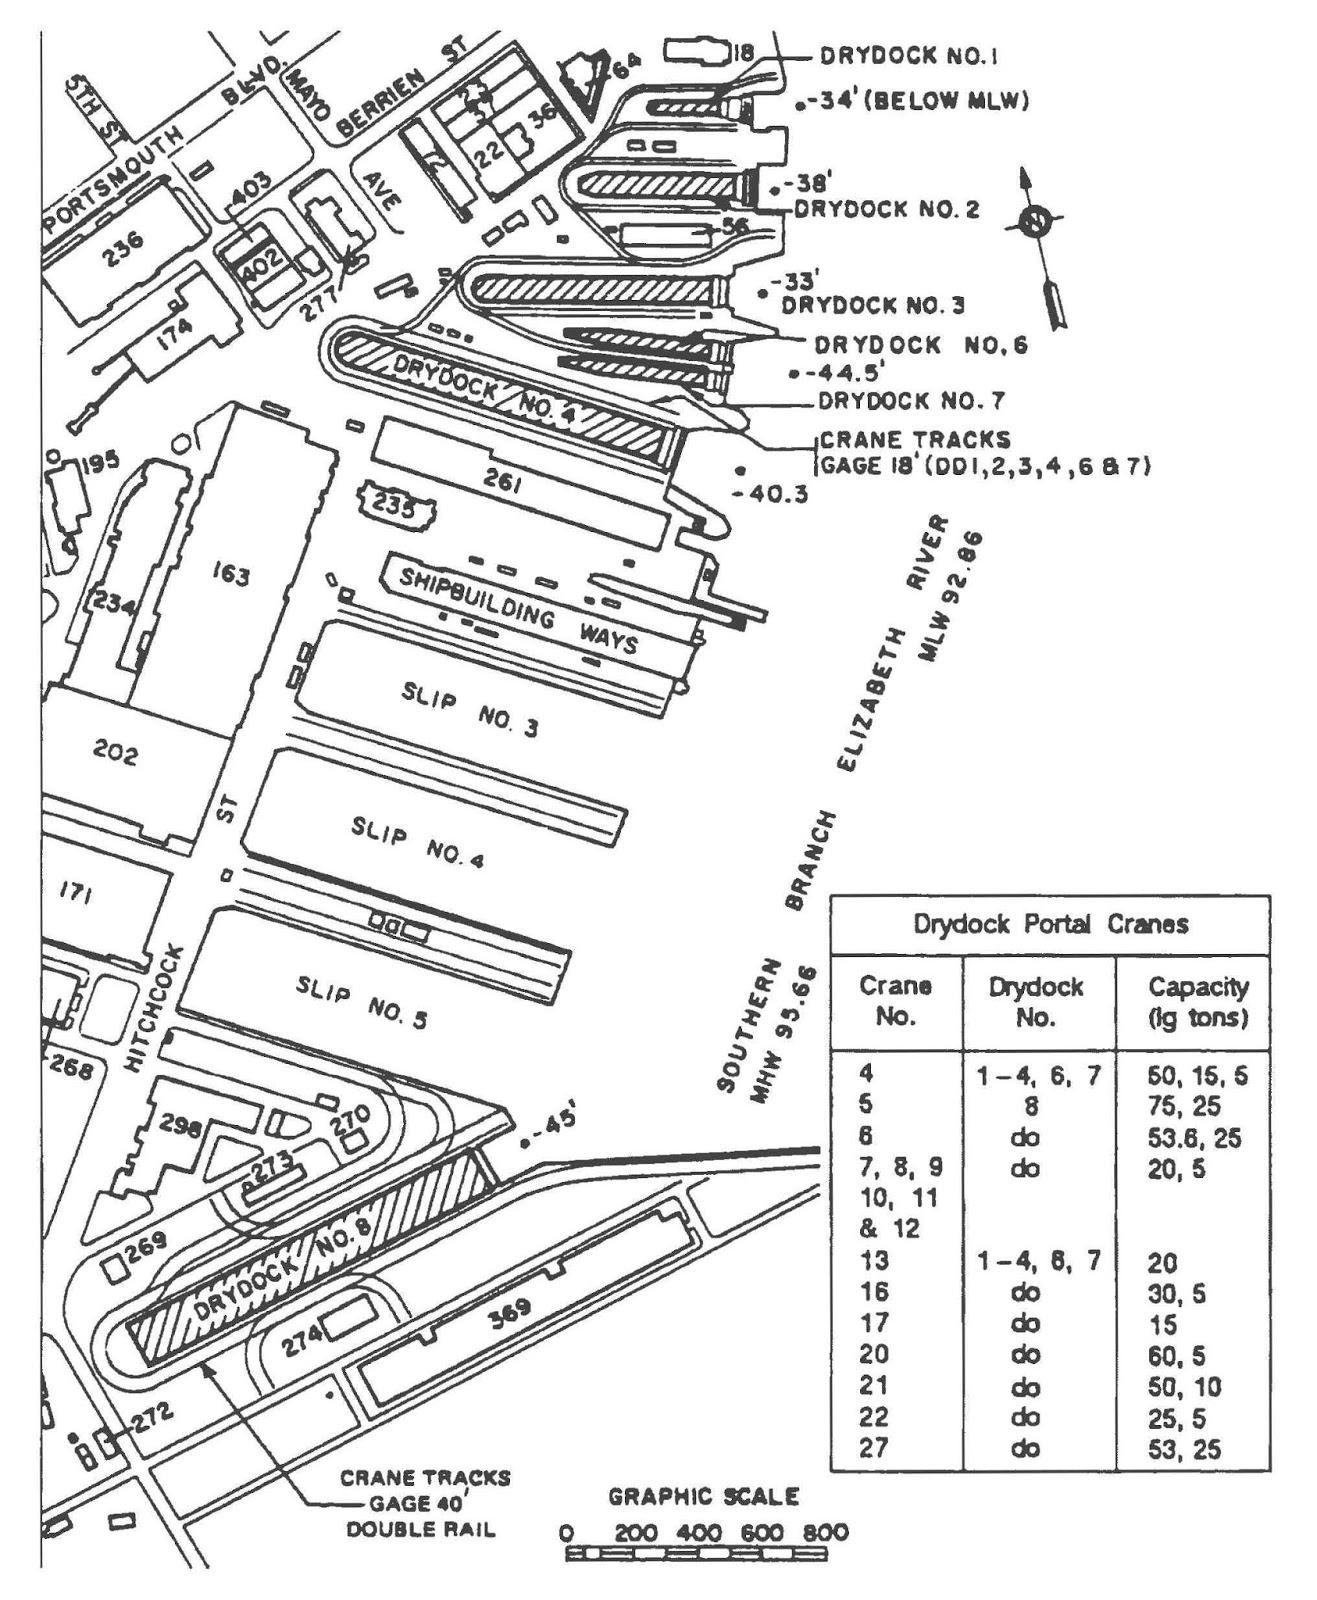 medium resolution of hampton roads naval museum historic gems norfolk naval shipyard s semi truck loading dock dimensions dry dock diagram